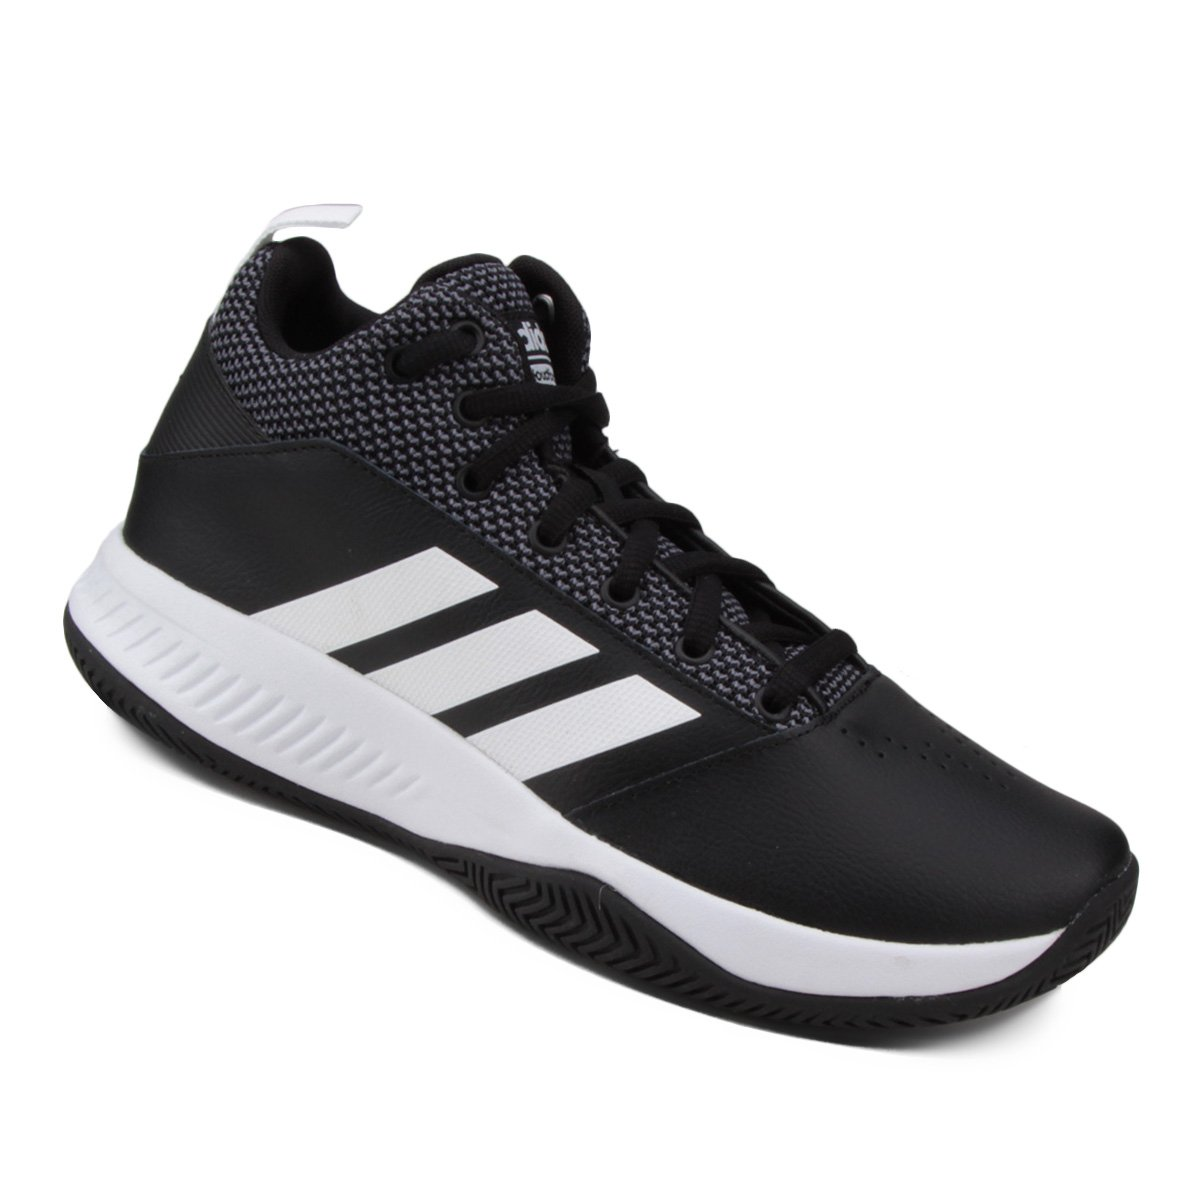 6f14d9c64b6 Tênis Adidas CF Ilation 2 Masculino - Compre Agora